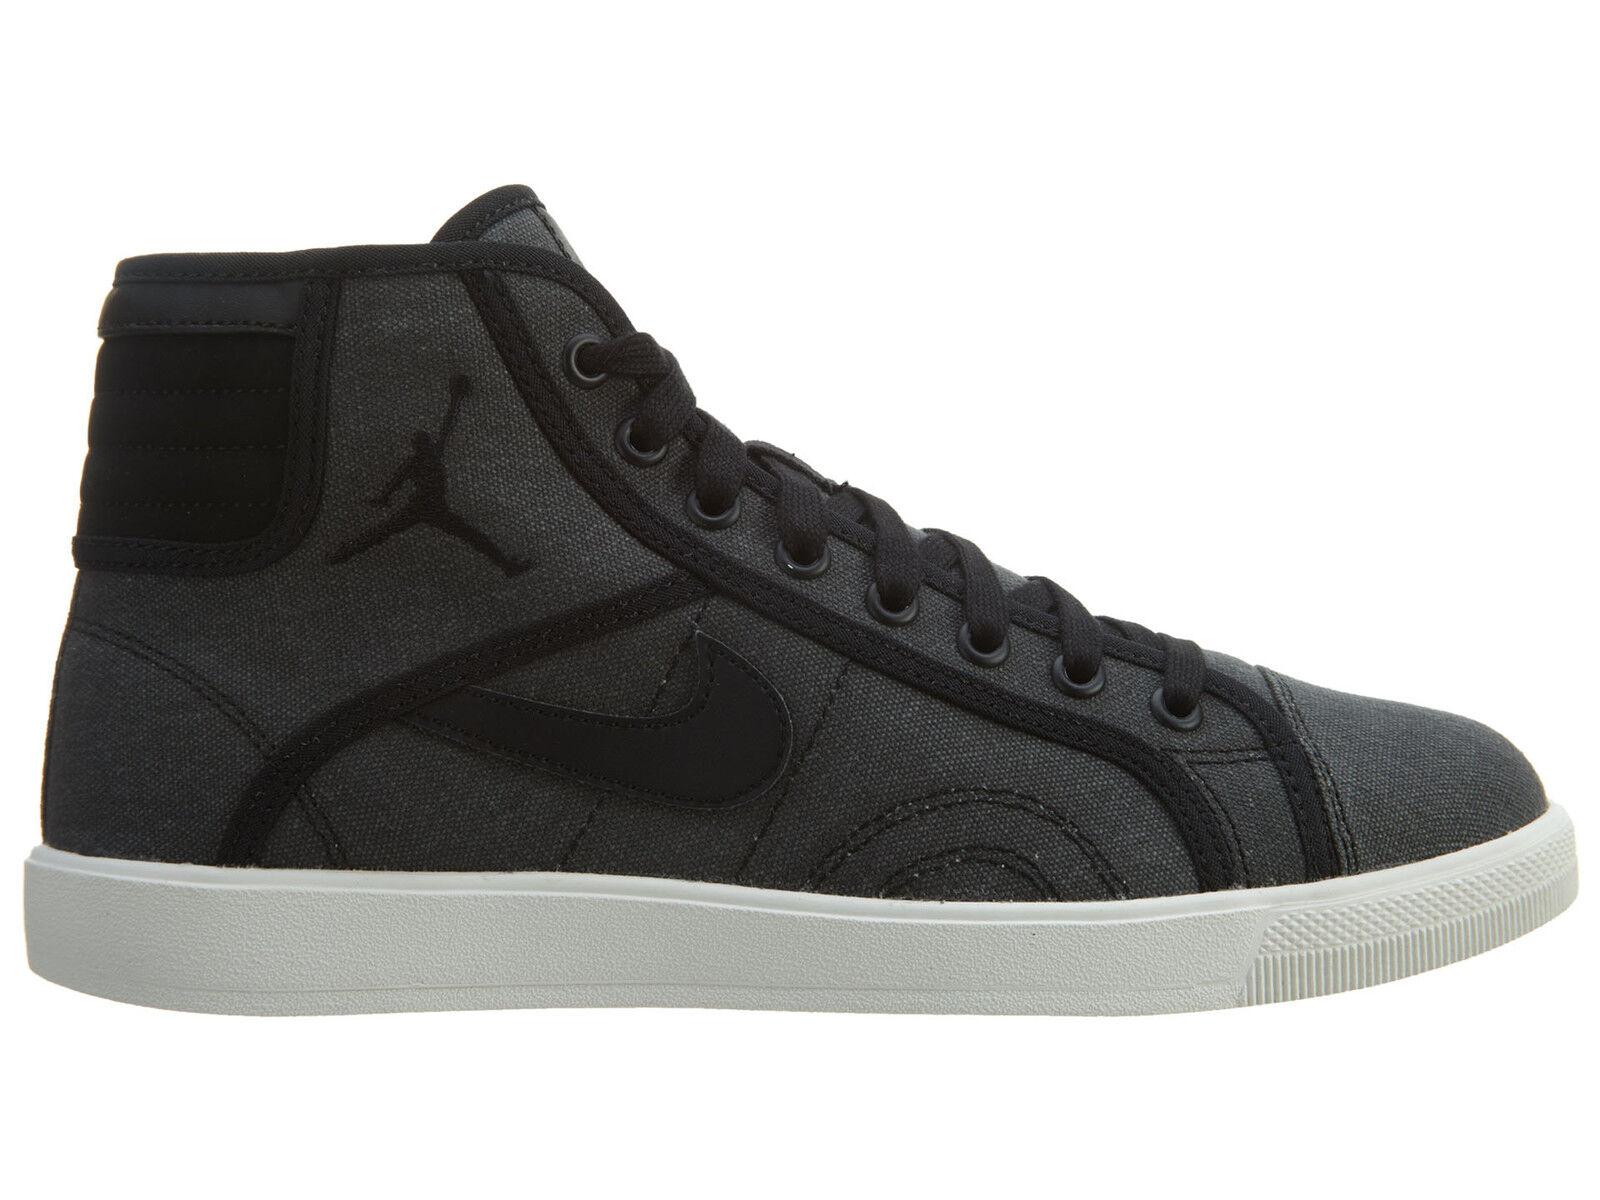 Air Jordan basketball Sky High og Hombre 820183-0vela negra basketball Jordan Zapatos Tamaño 8 25440b